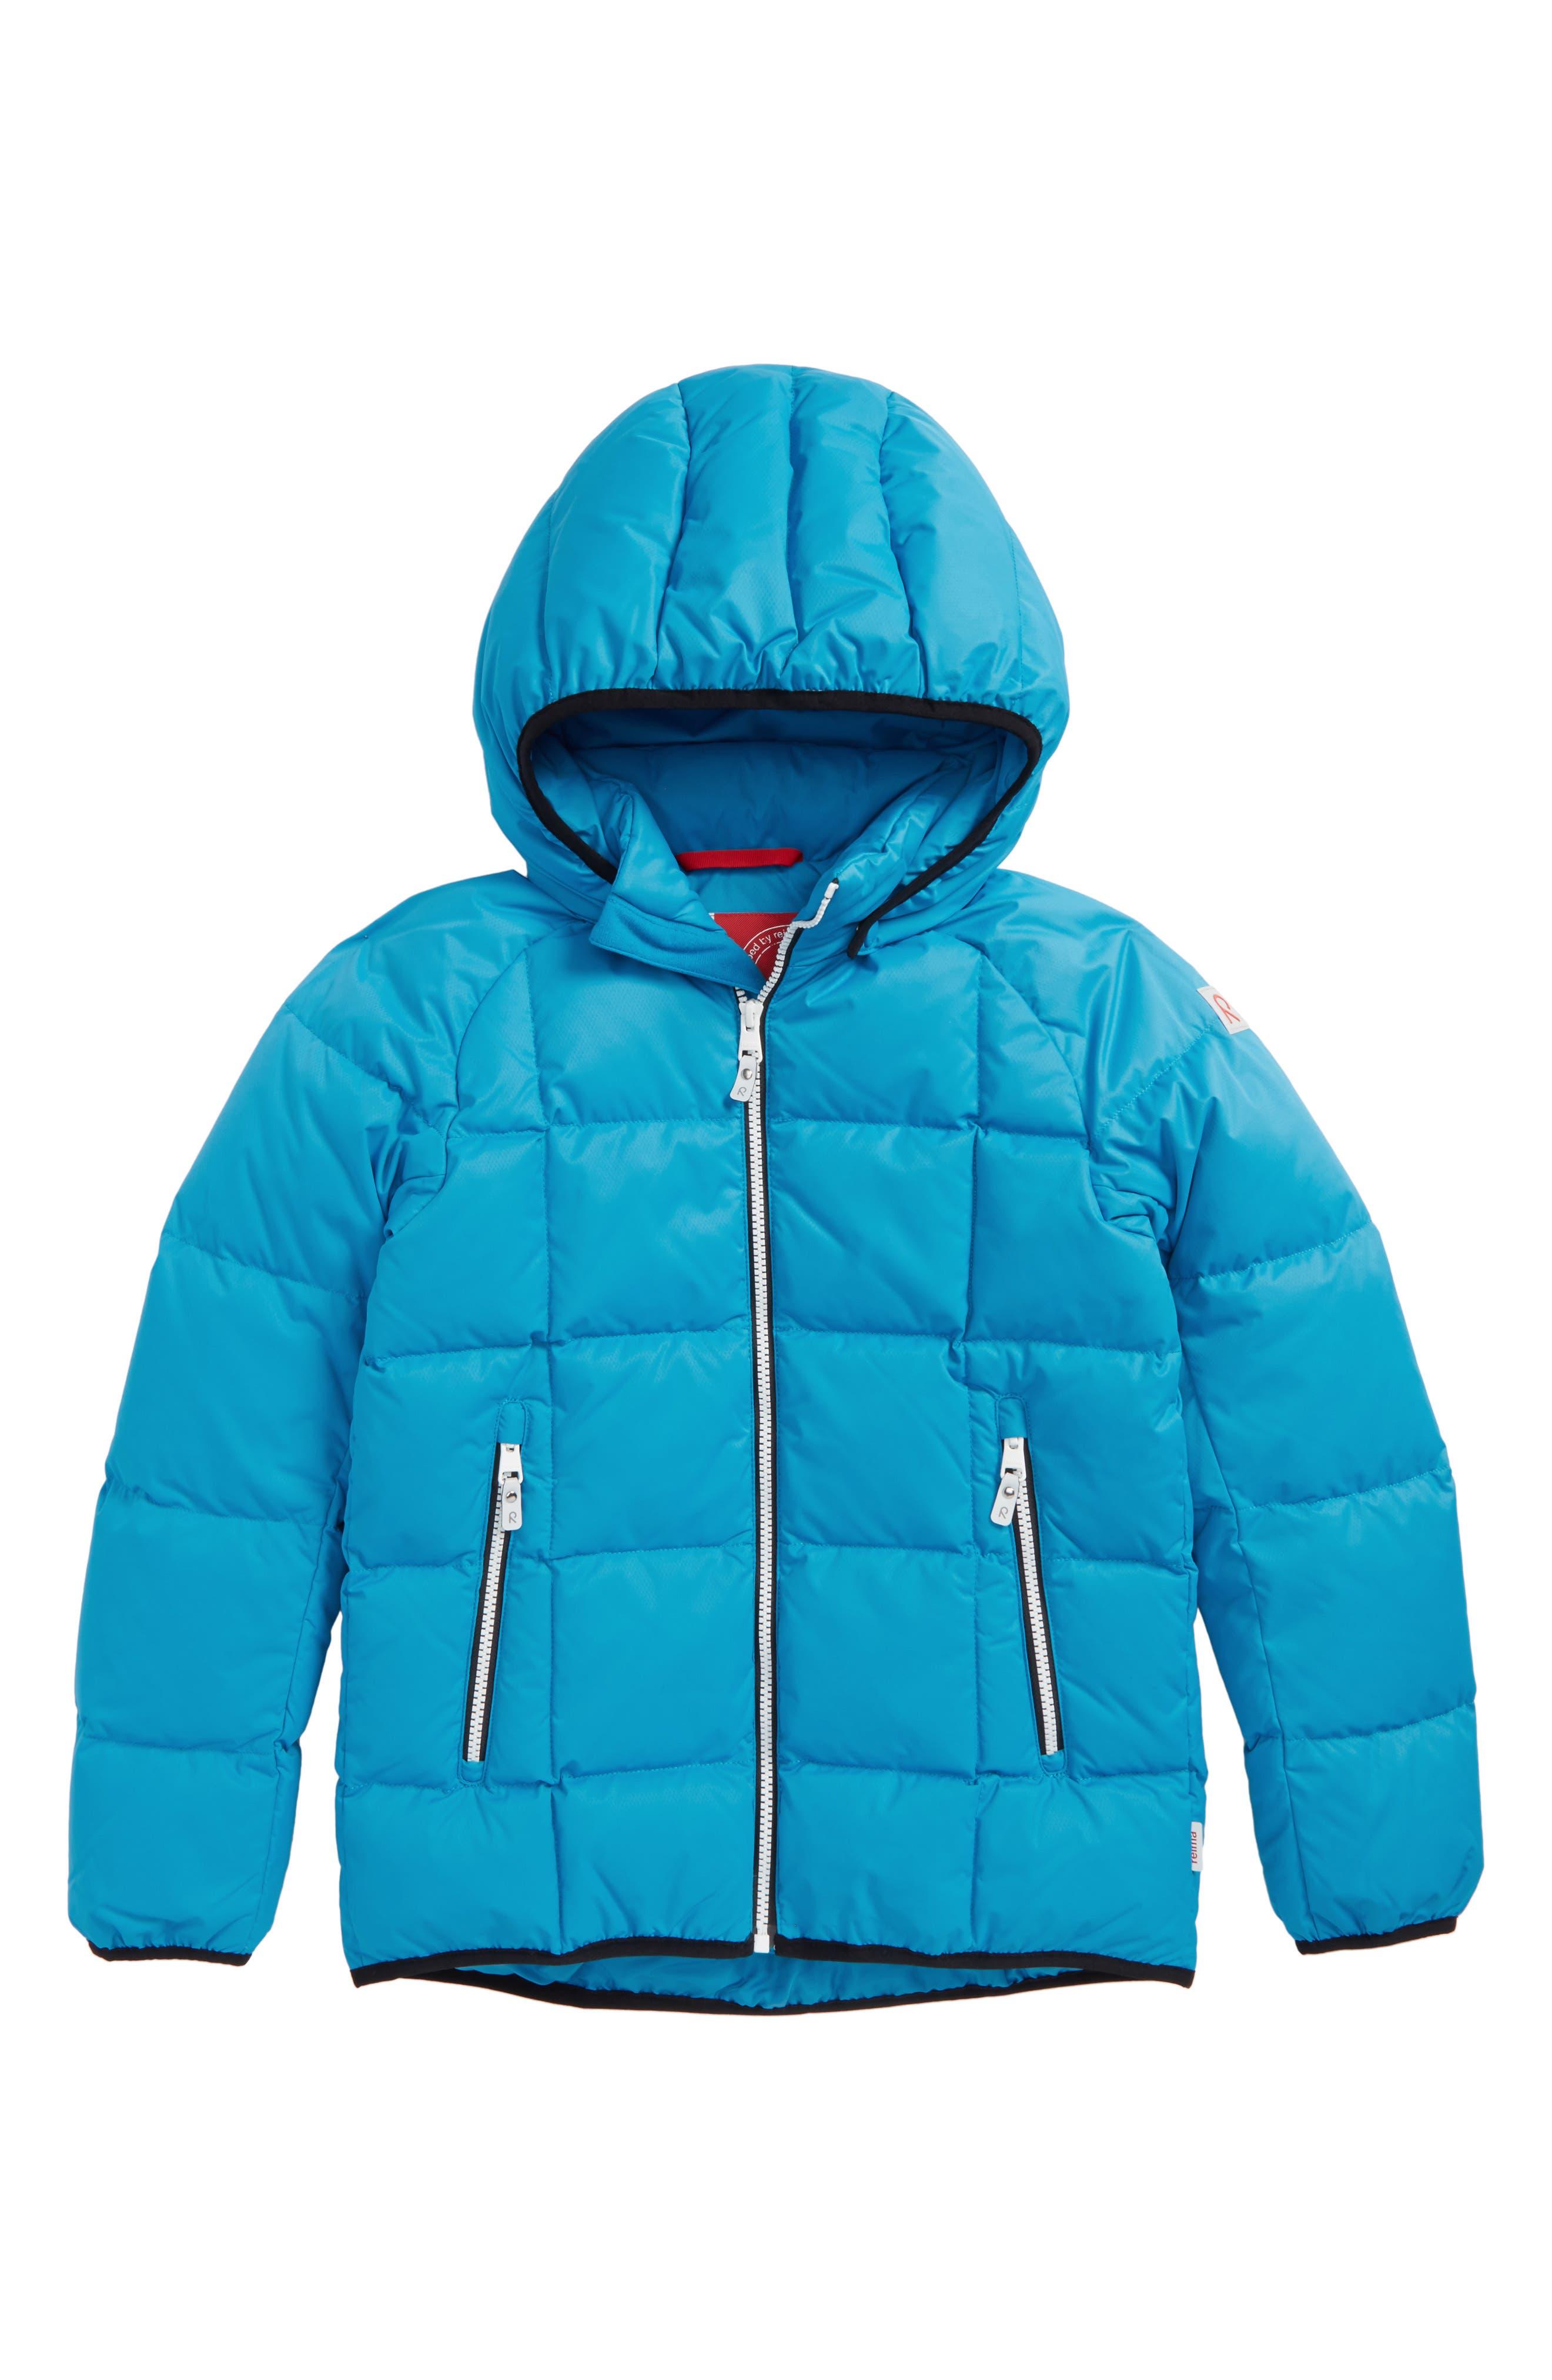 Jord Down Waterproof Insulated Coat,                             Main thumbnail 1, color,                             400